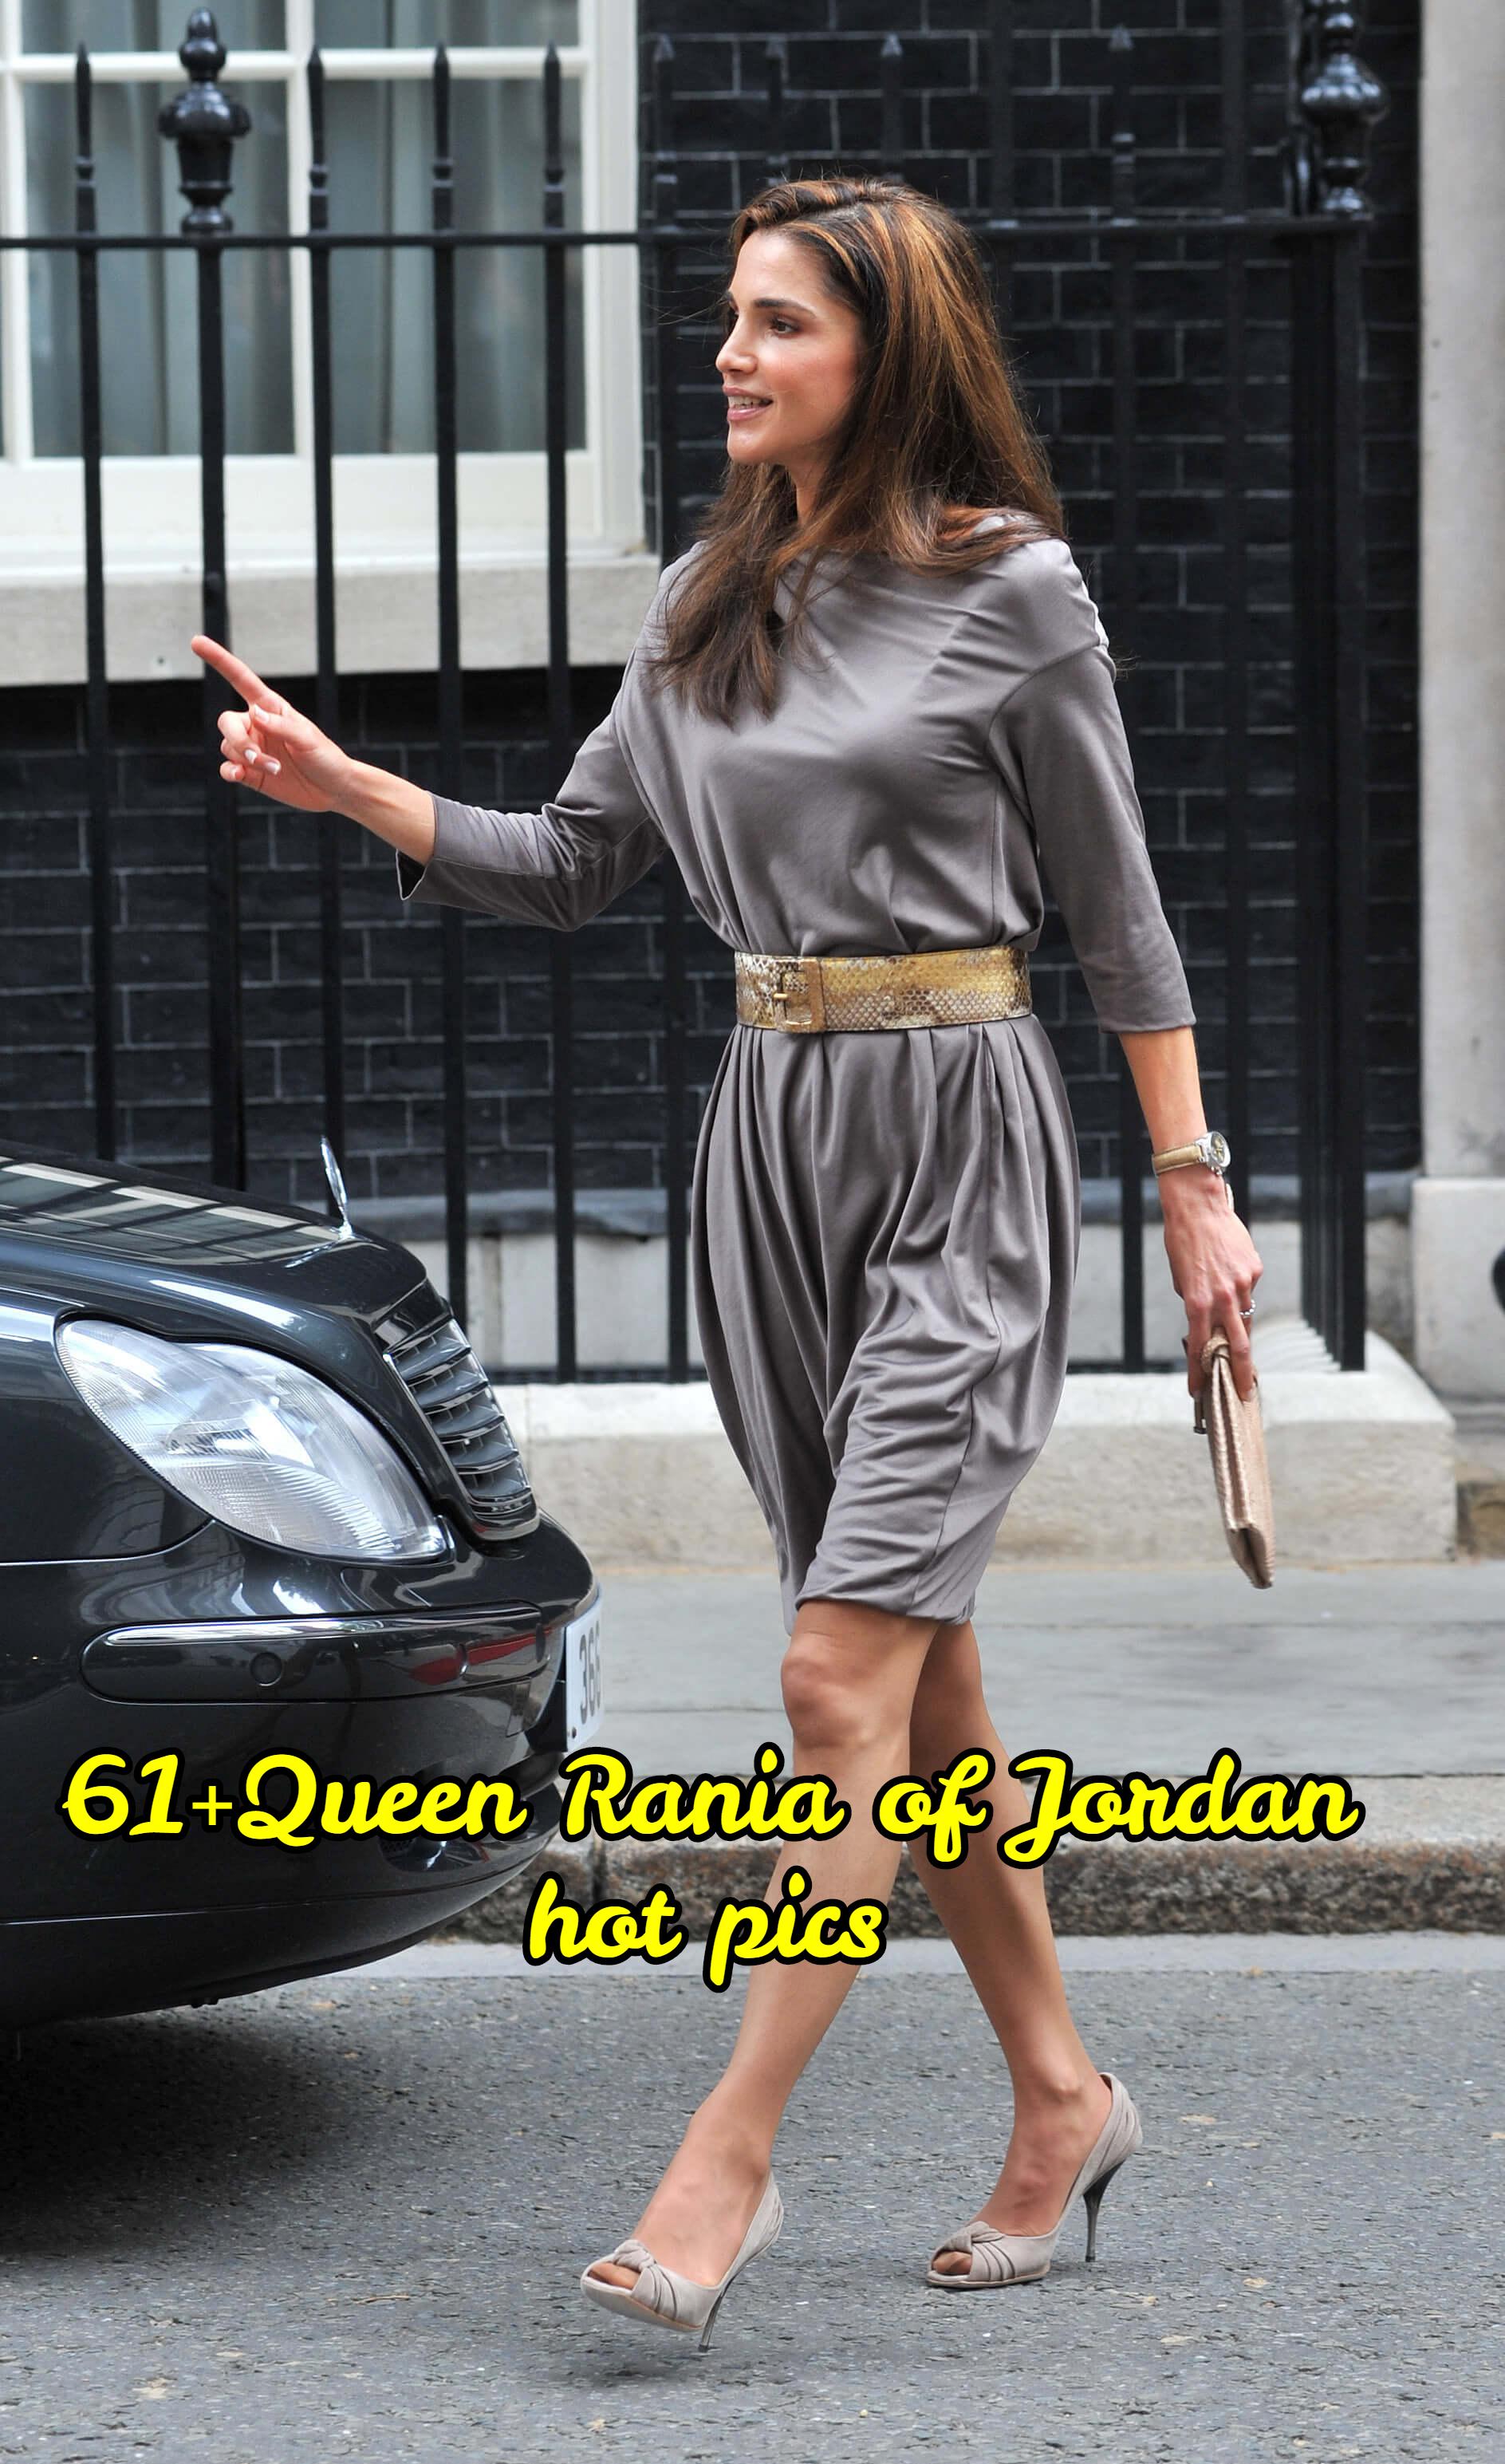 Queen Rania HOT